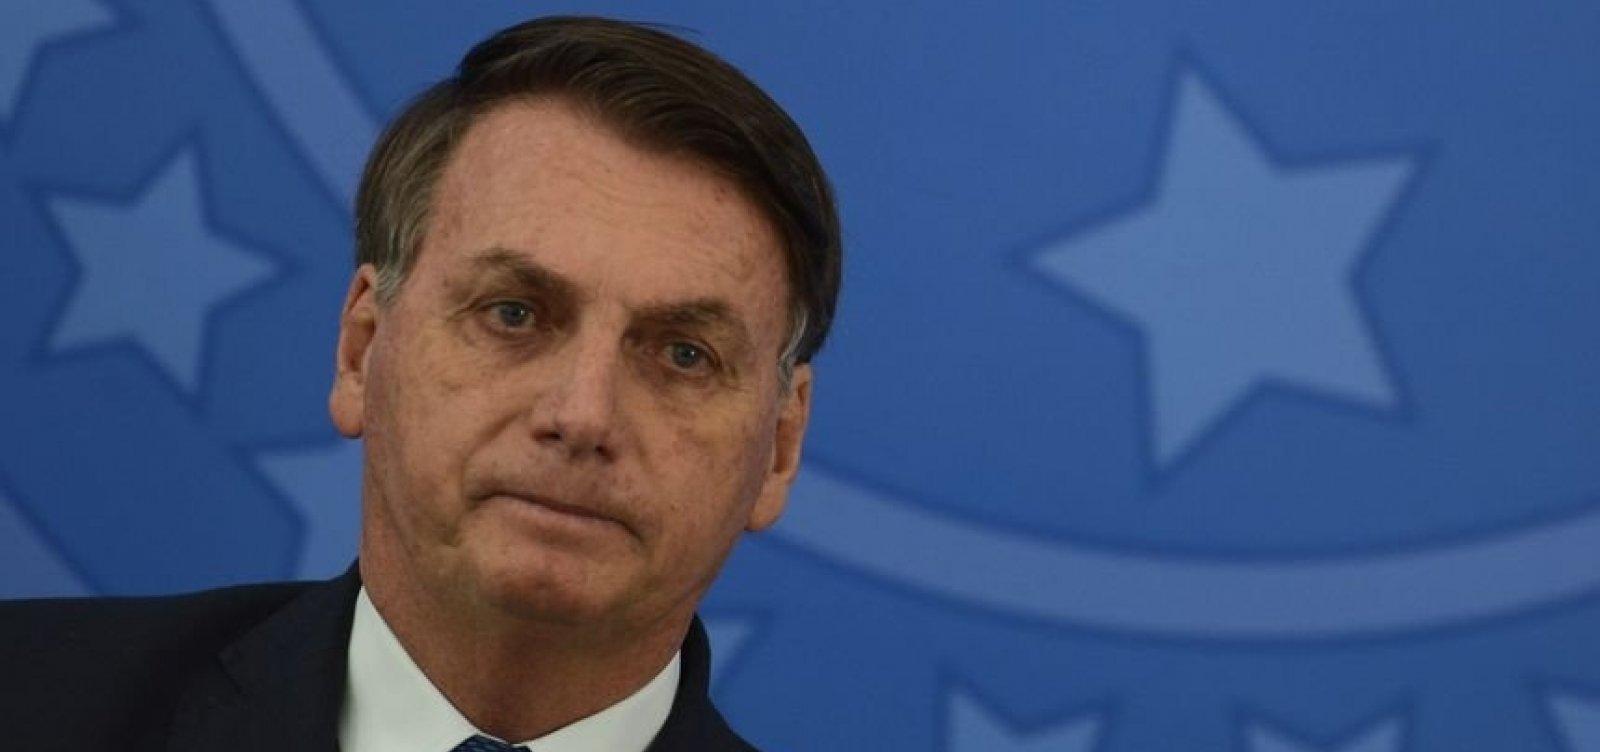 [Bolsonaro teve resultado negativo nos três testes para o novo coronavírus]